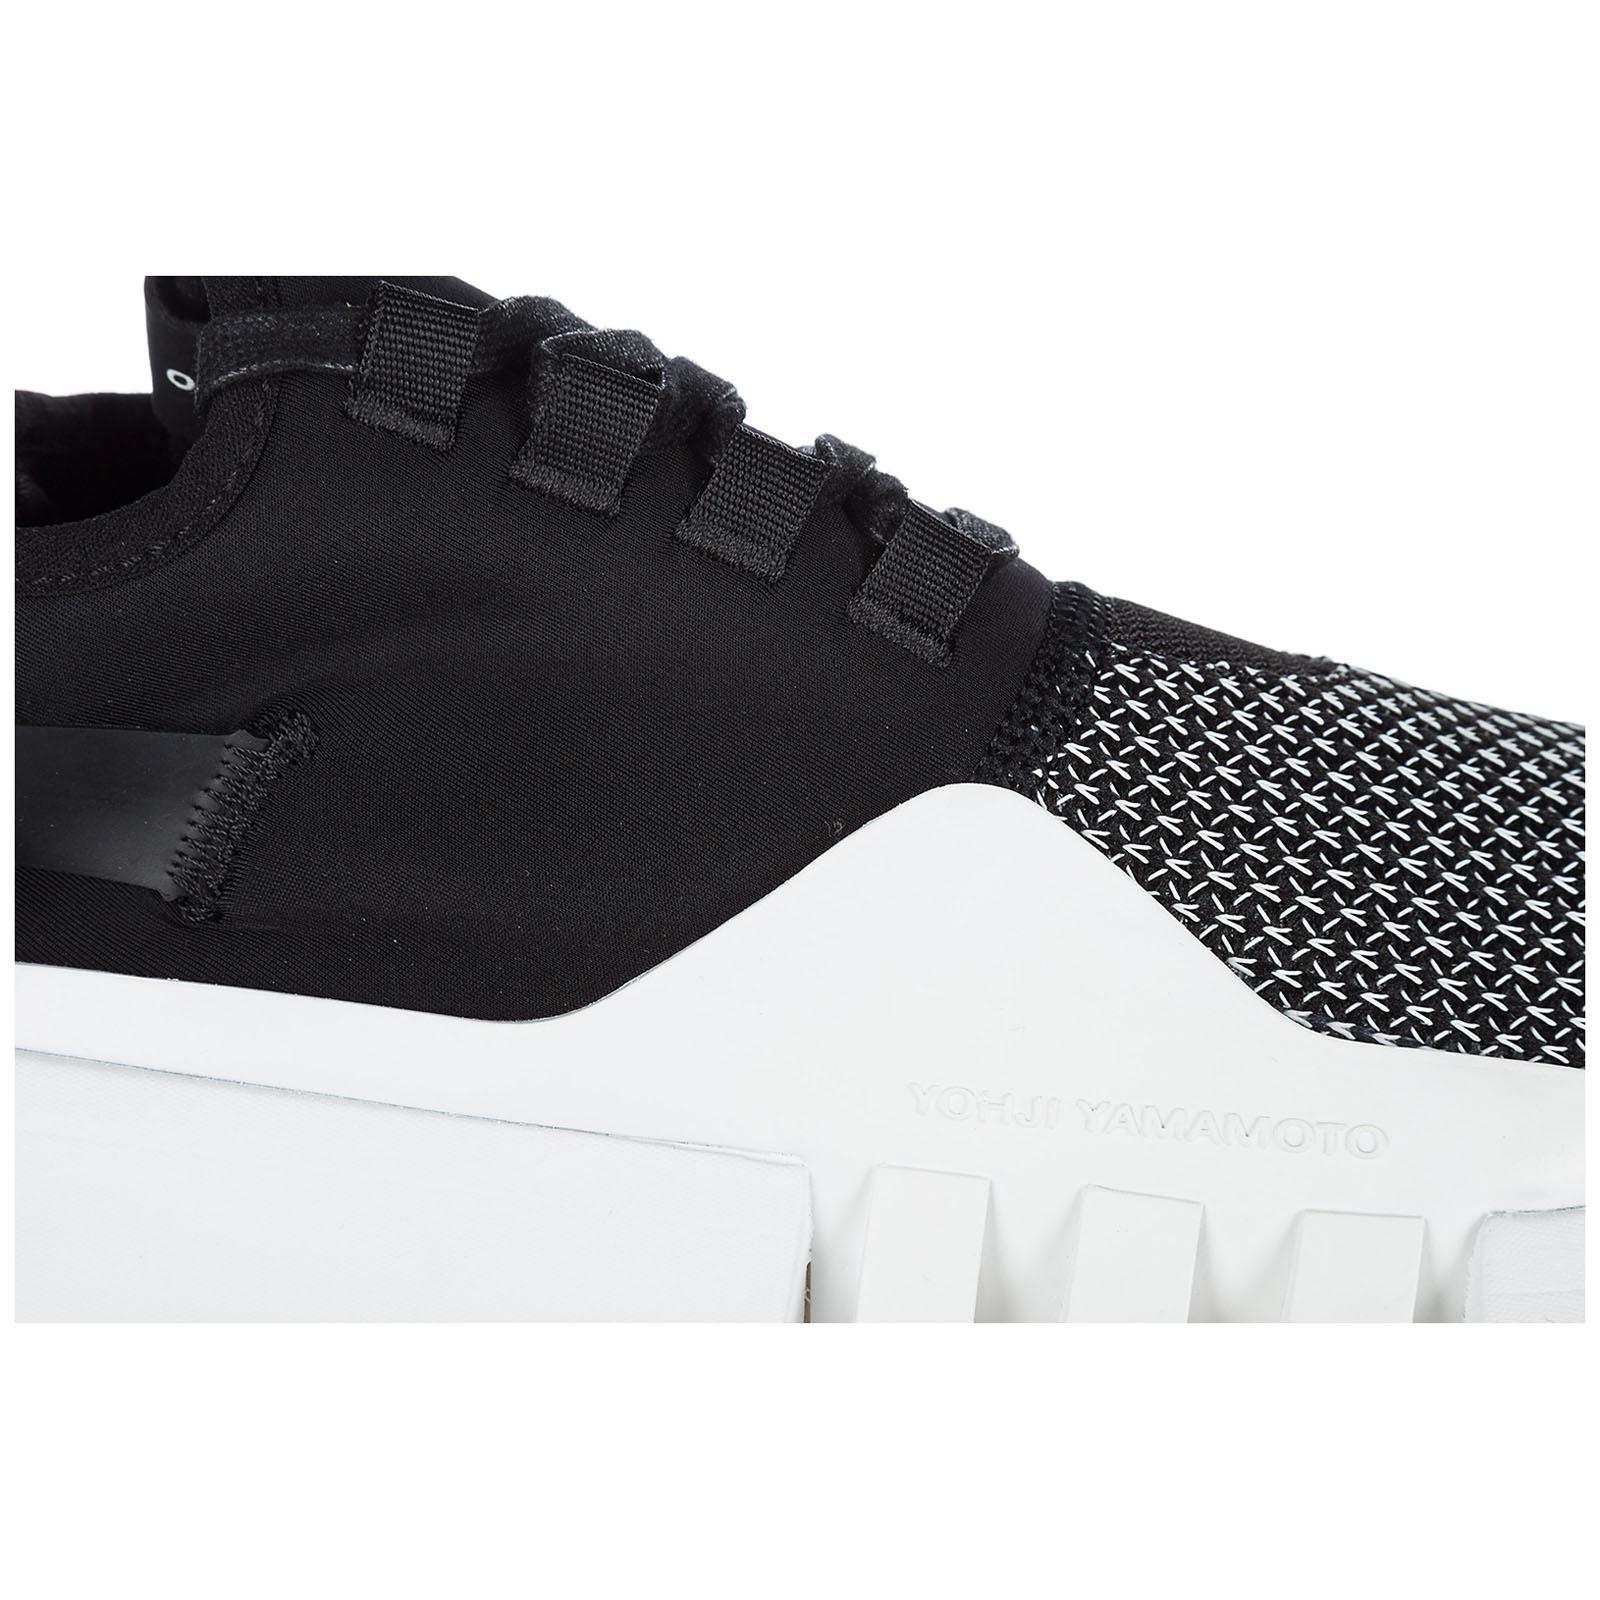 0e1b7f8749c7b Lyst - Y-3 Shoes Trainers Sneakers Yohji Yamamoto Ayero in Black for Men